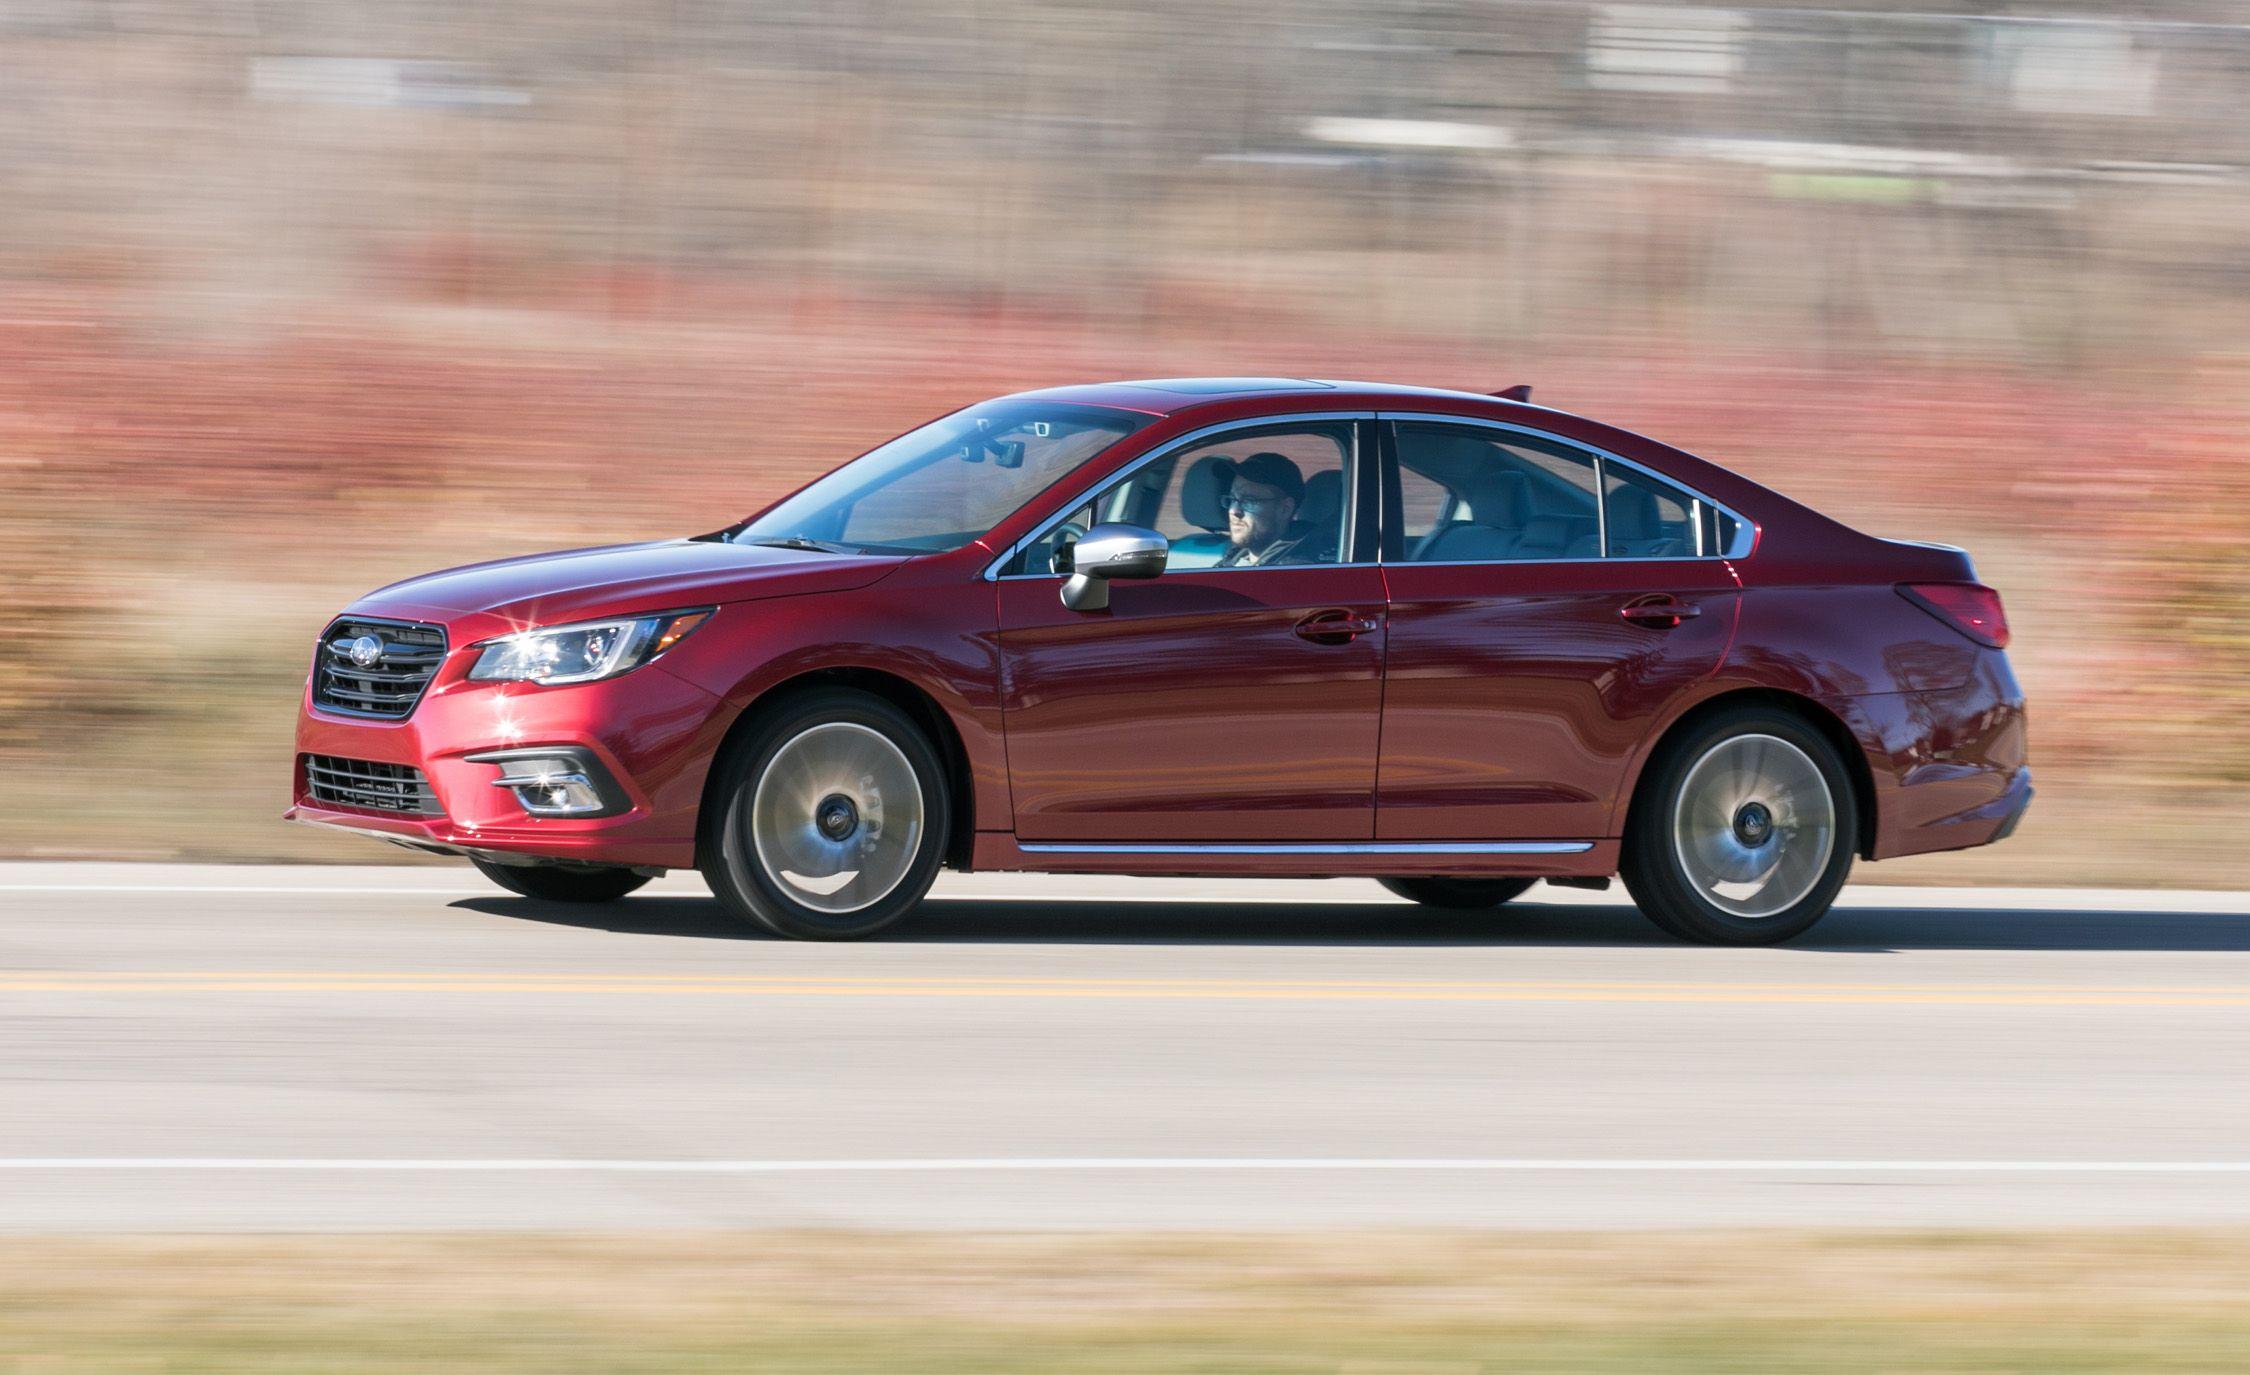 2018 Subaru Legacy Reviews, Performance, Interior, Exterior, Engine